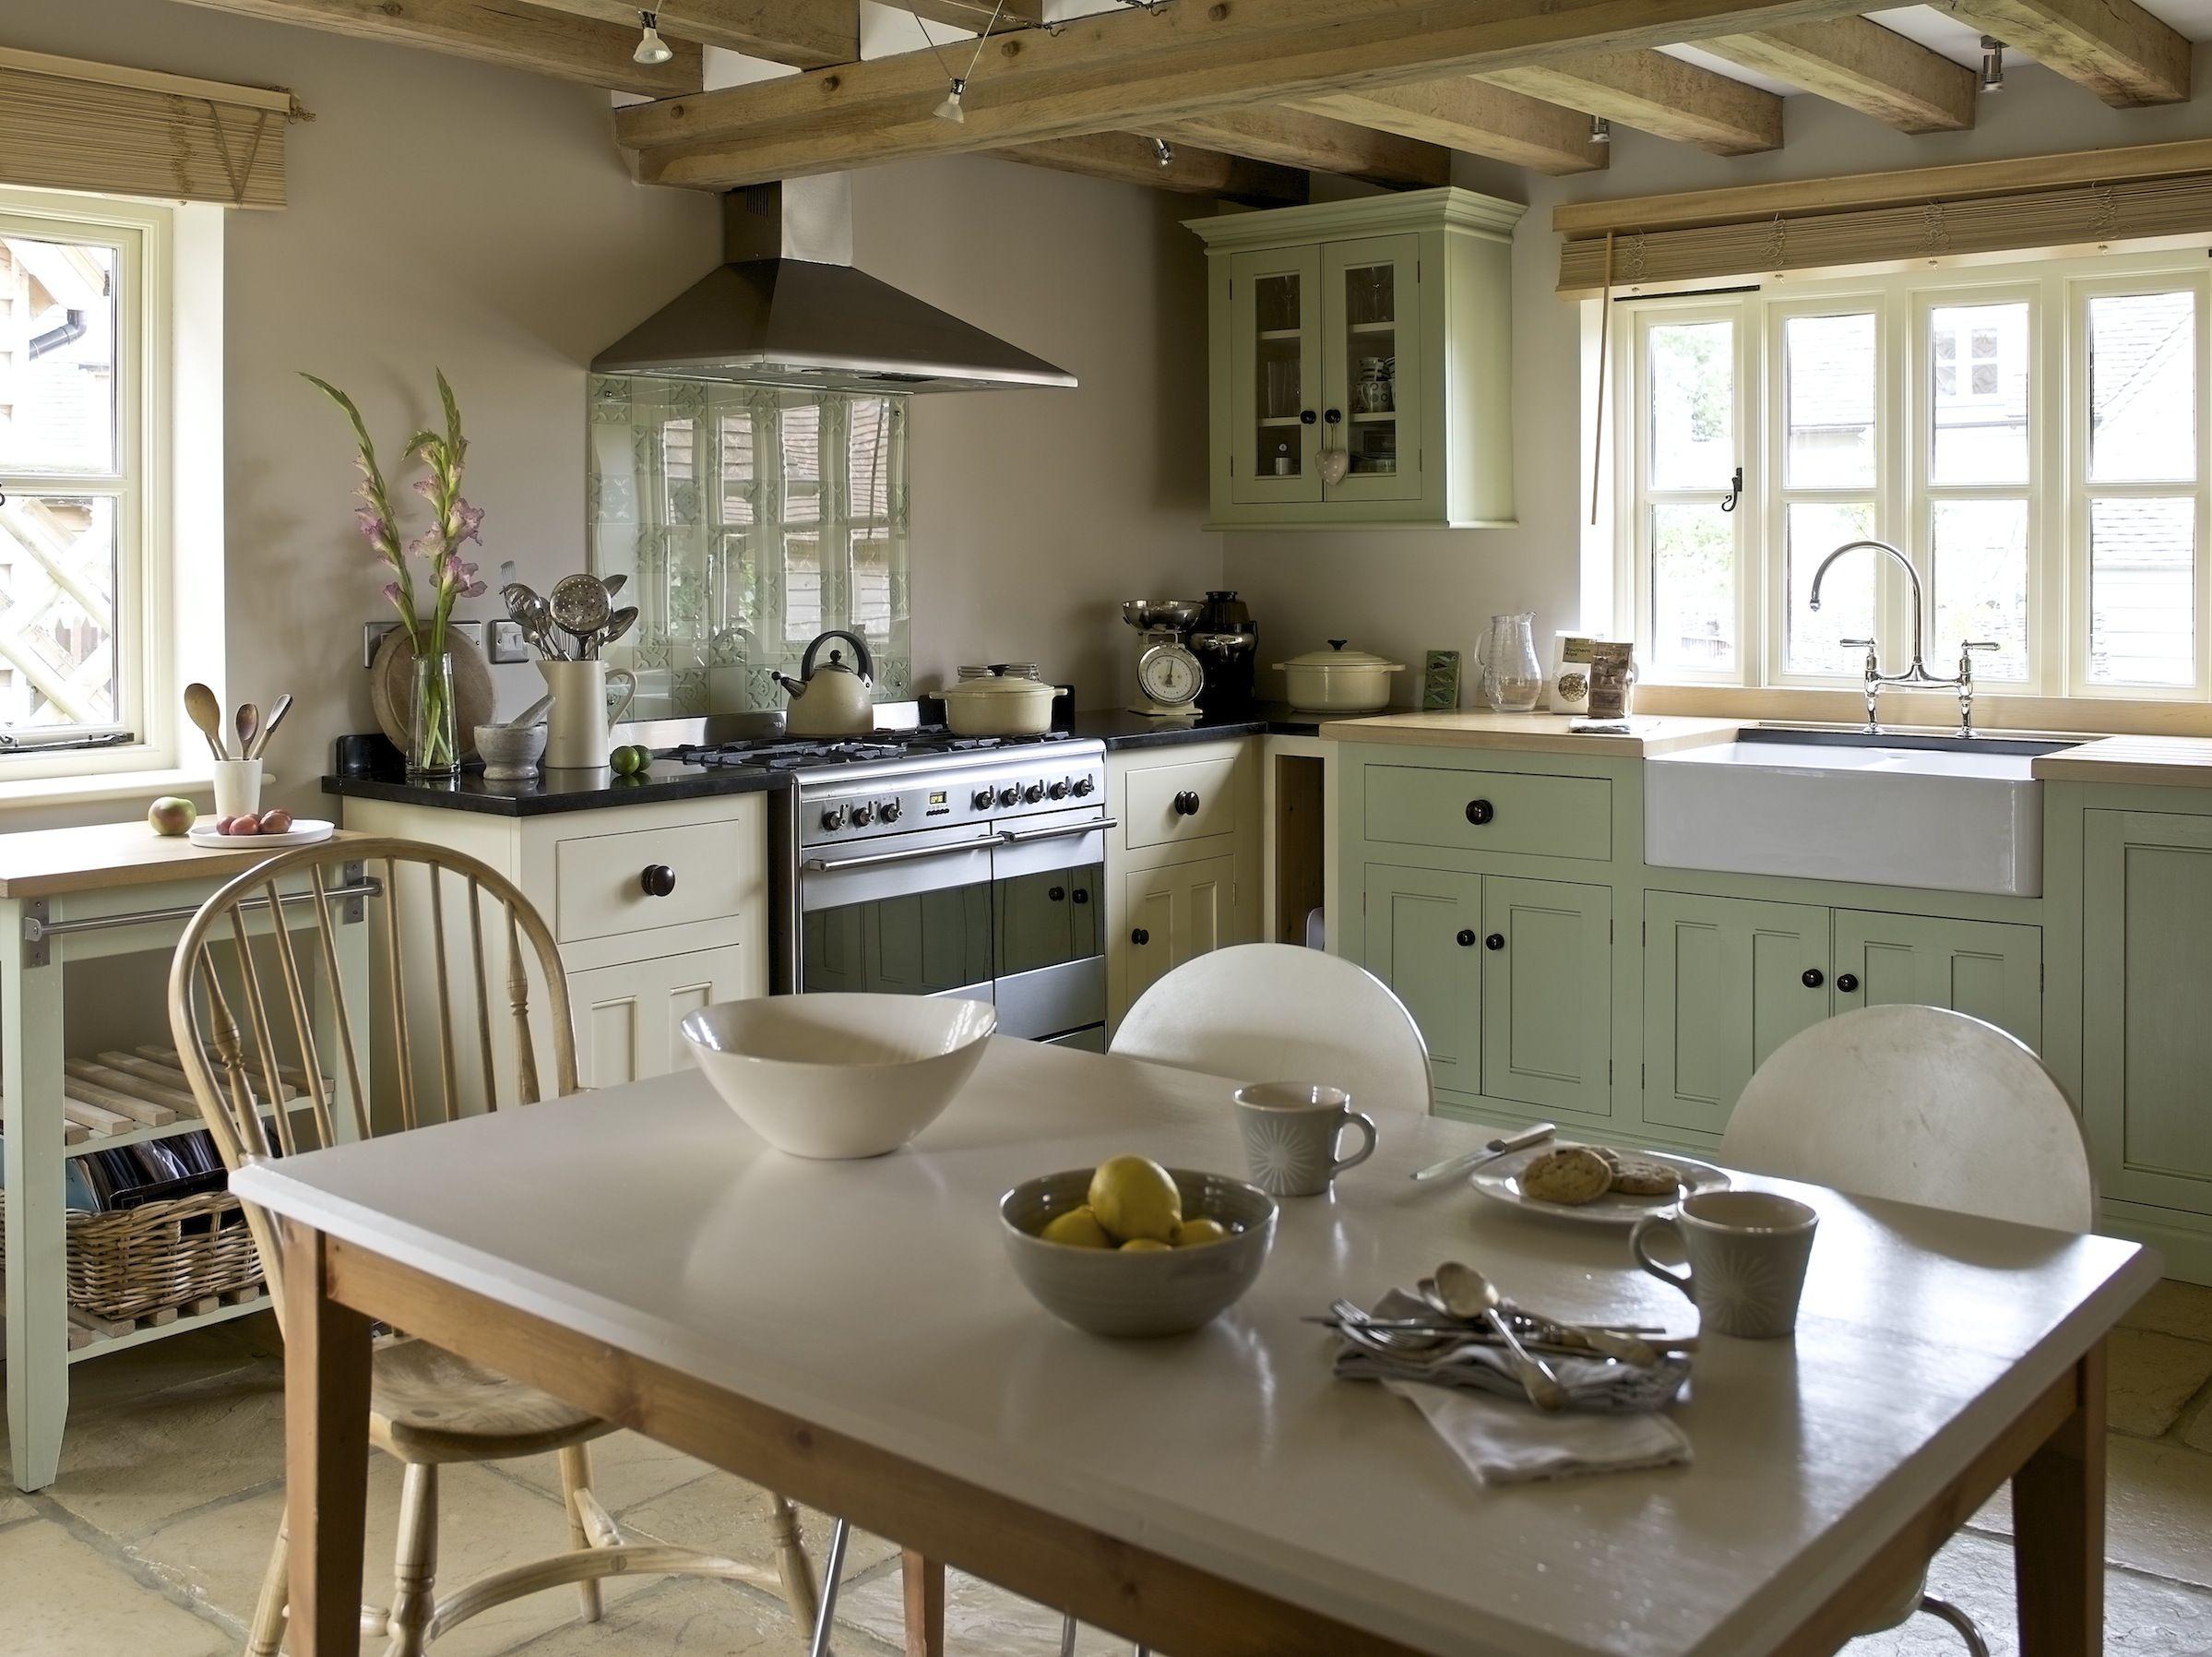 i really want an eatin farmhouse style kitchen Country